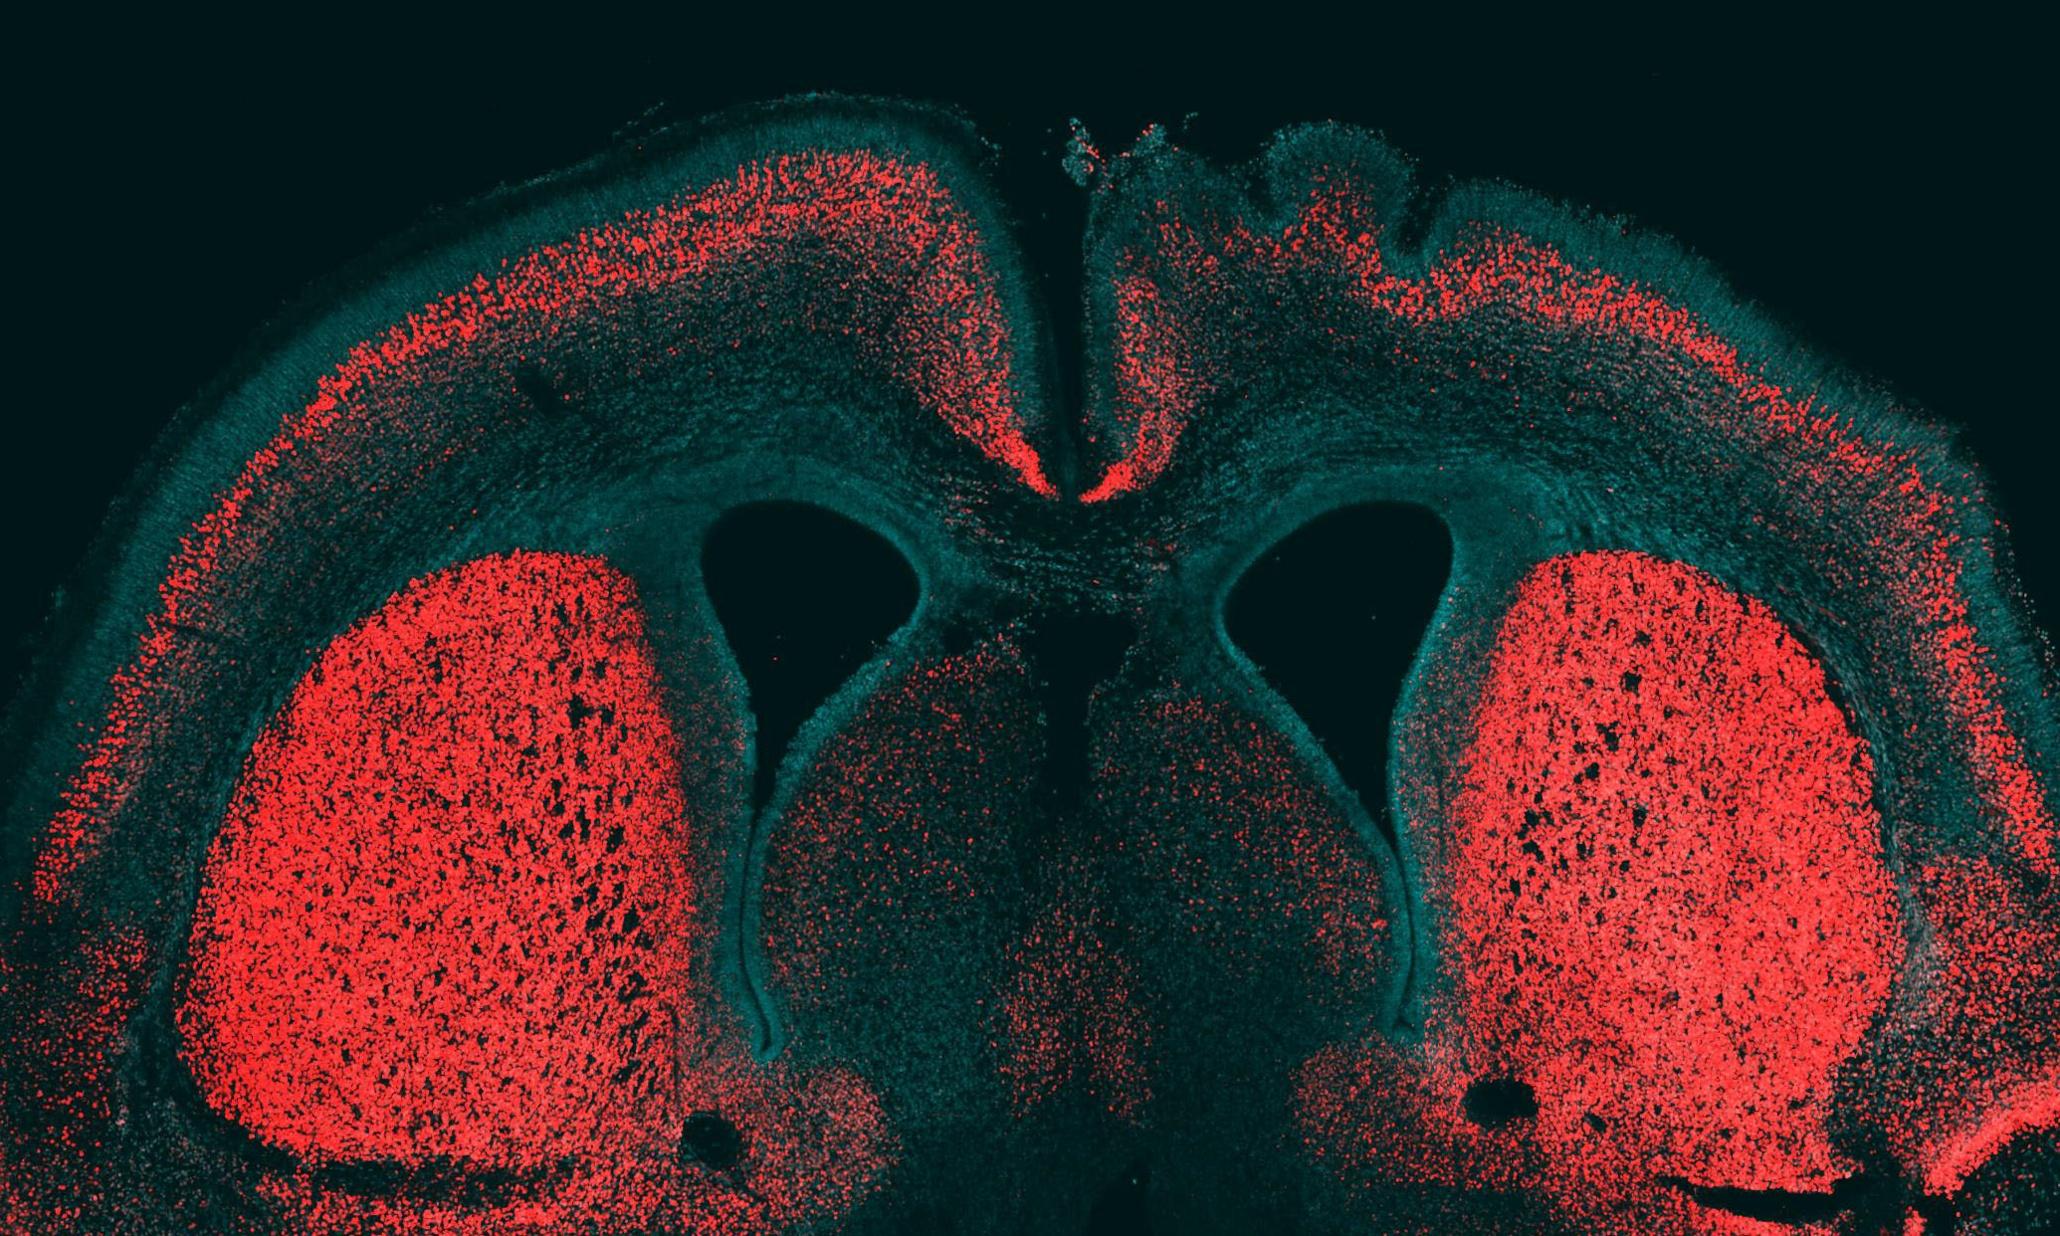 TBI & Neuroscience - Magazine cover